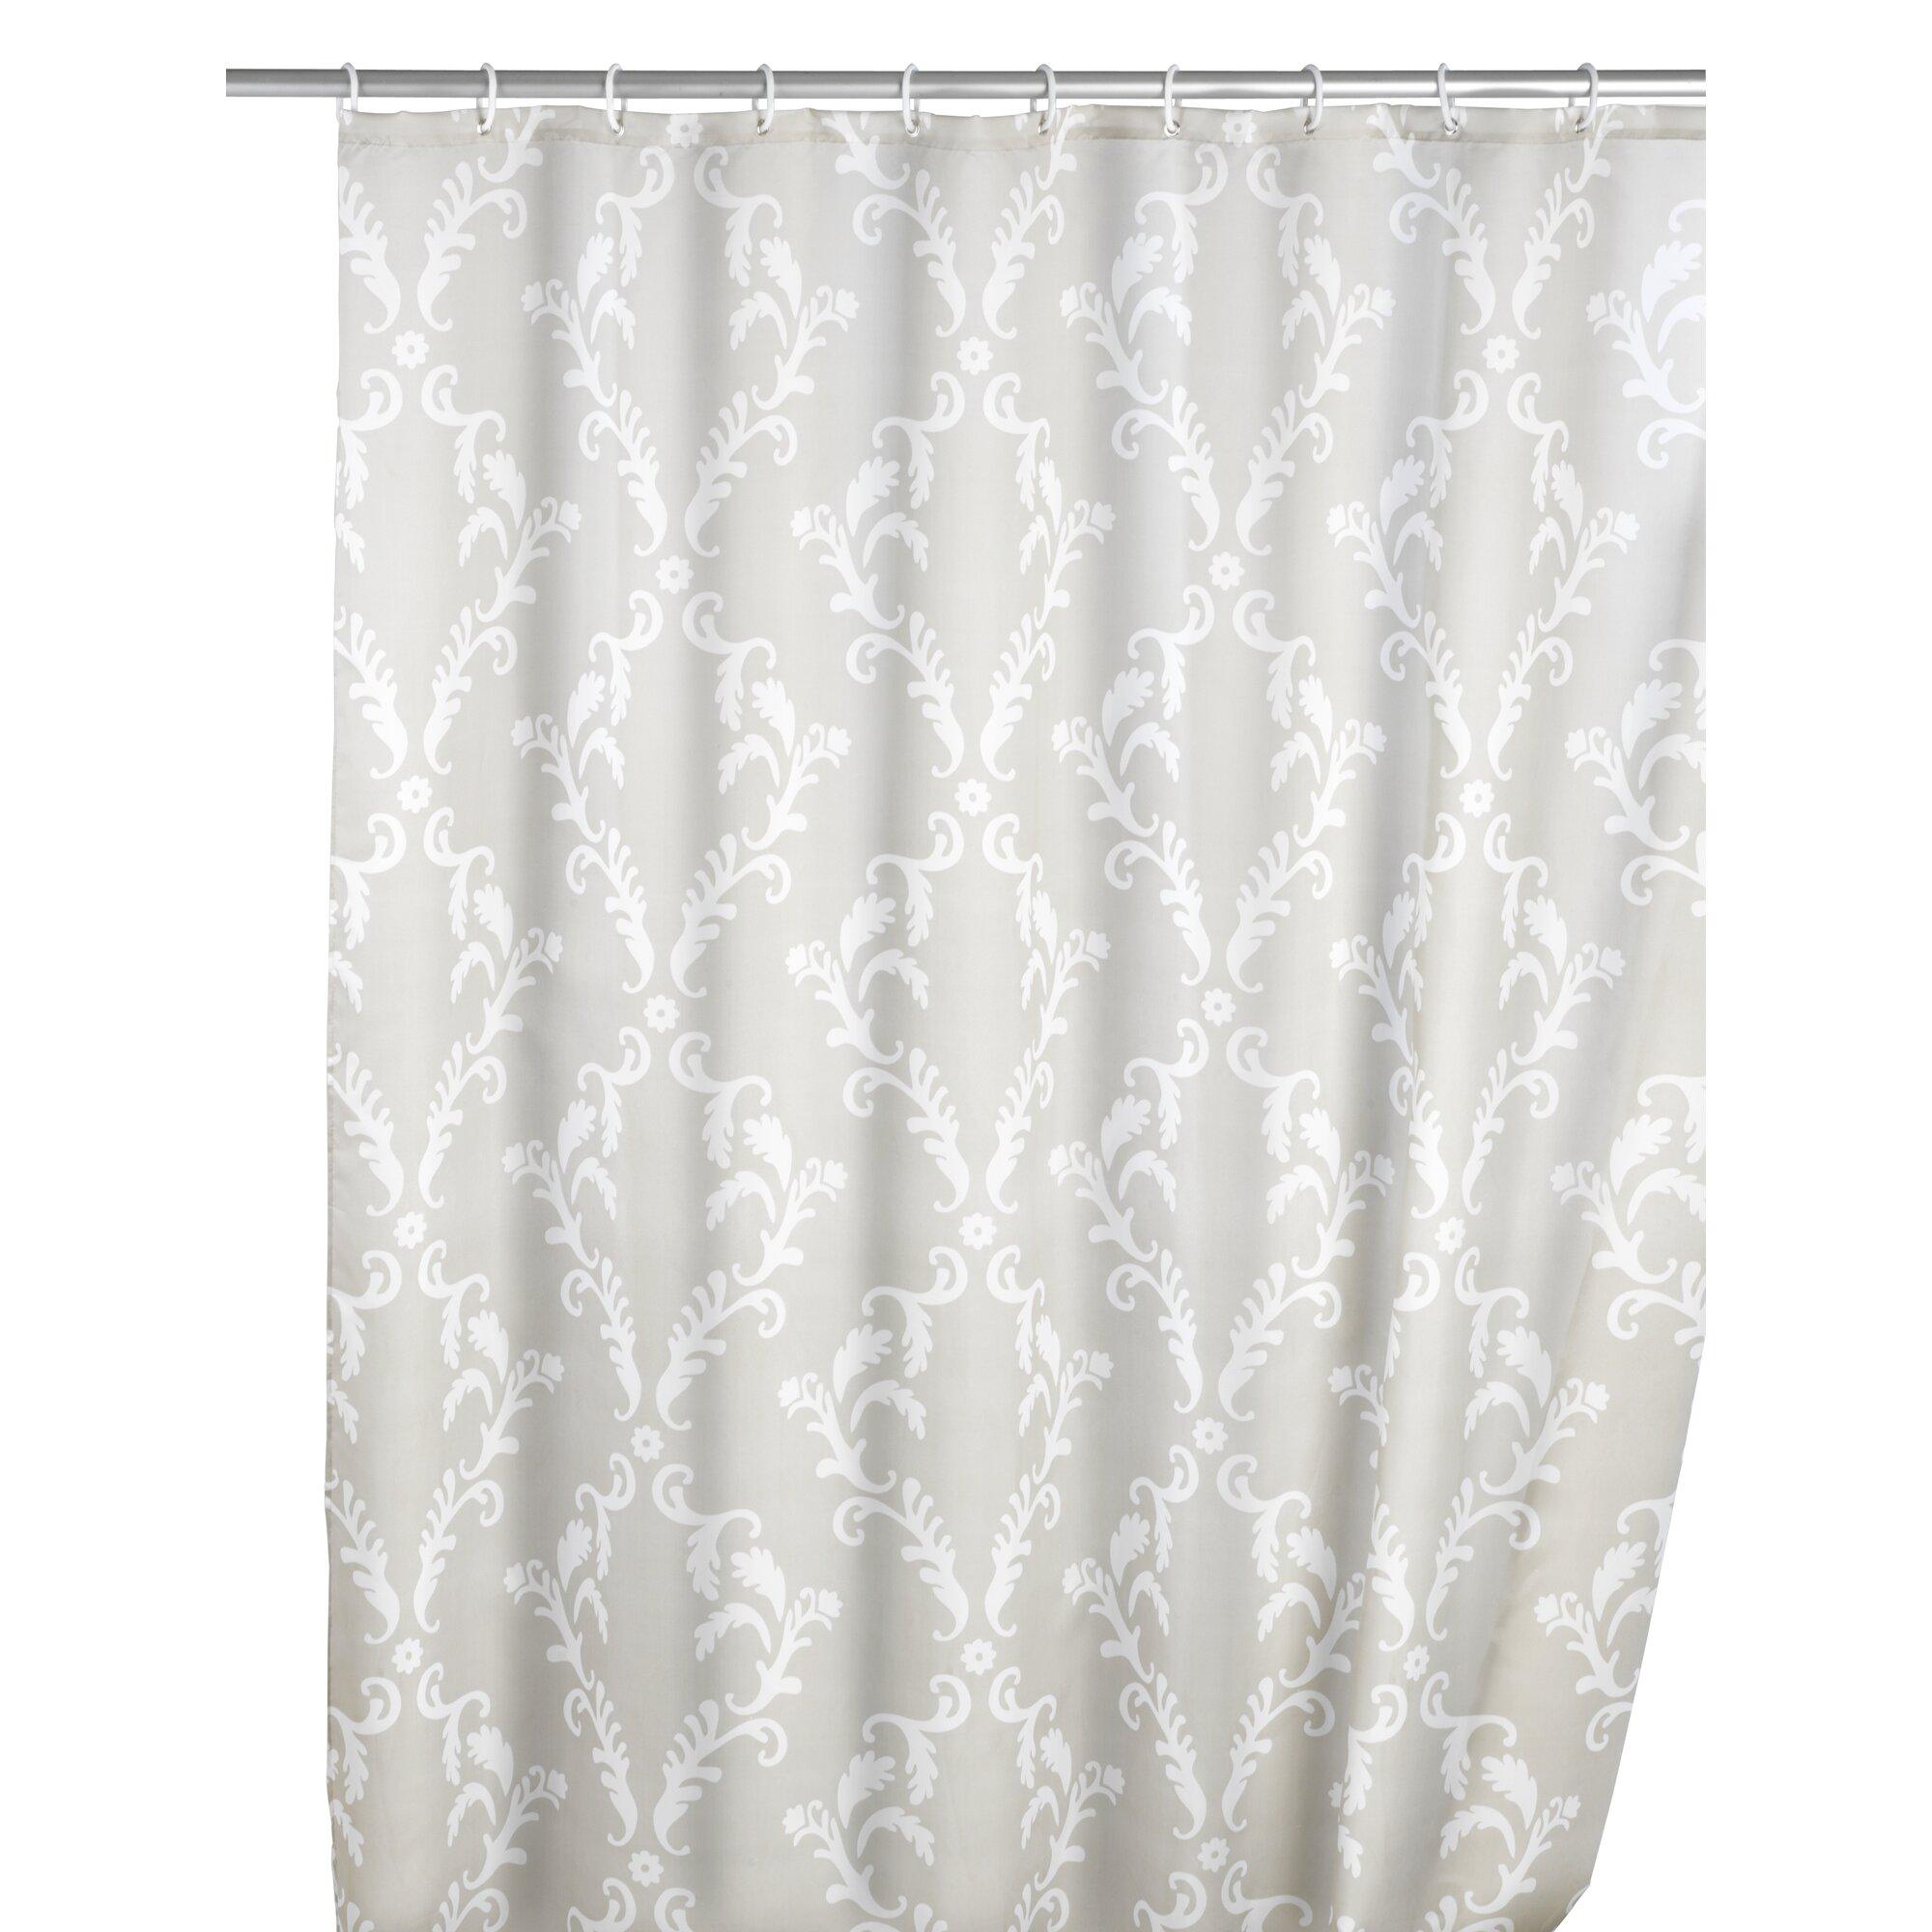 Nautica palmetto bay stripe shower curtain from beddingstyle com - Wenko Fl Anti Mould Shower Curtain Reviews Wayfair Co Uk